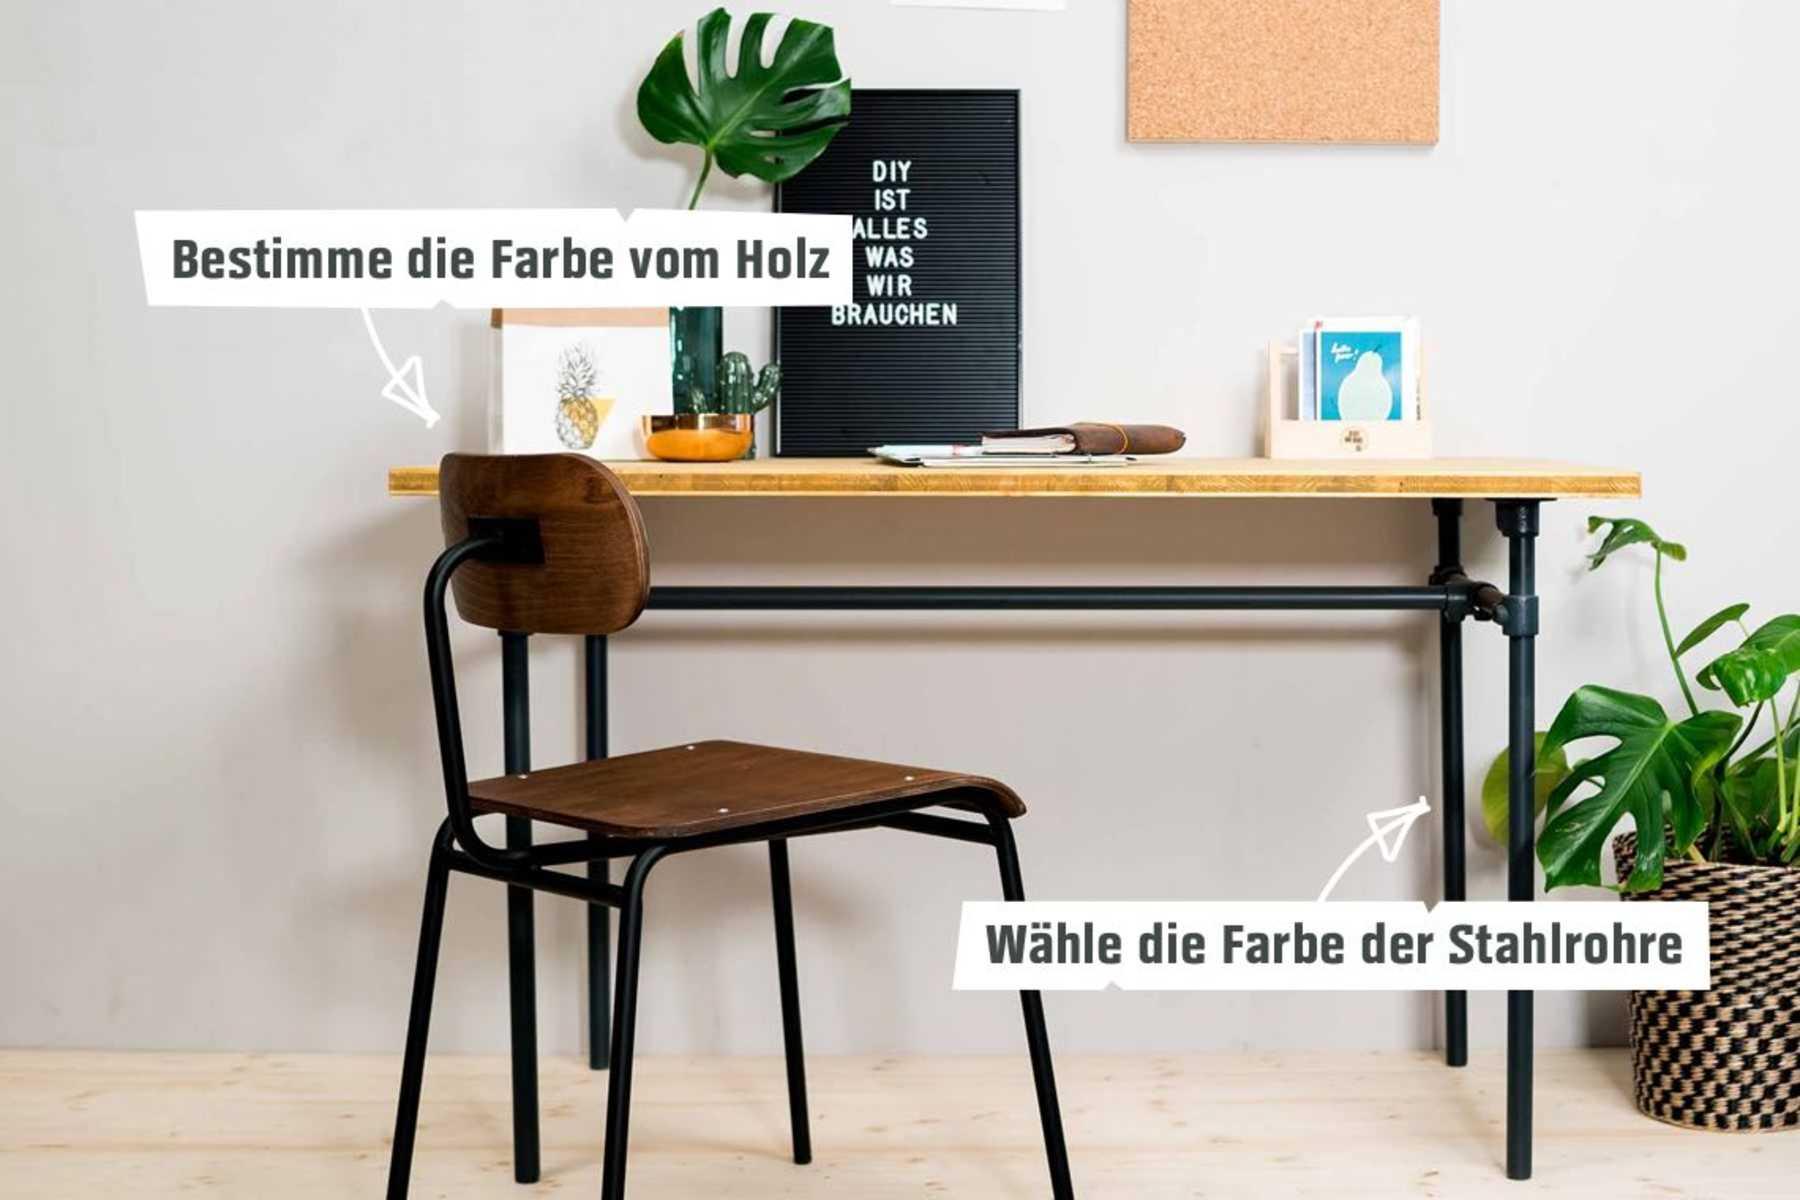 Tisch Rohrbert CREATE! by OBI